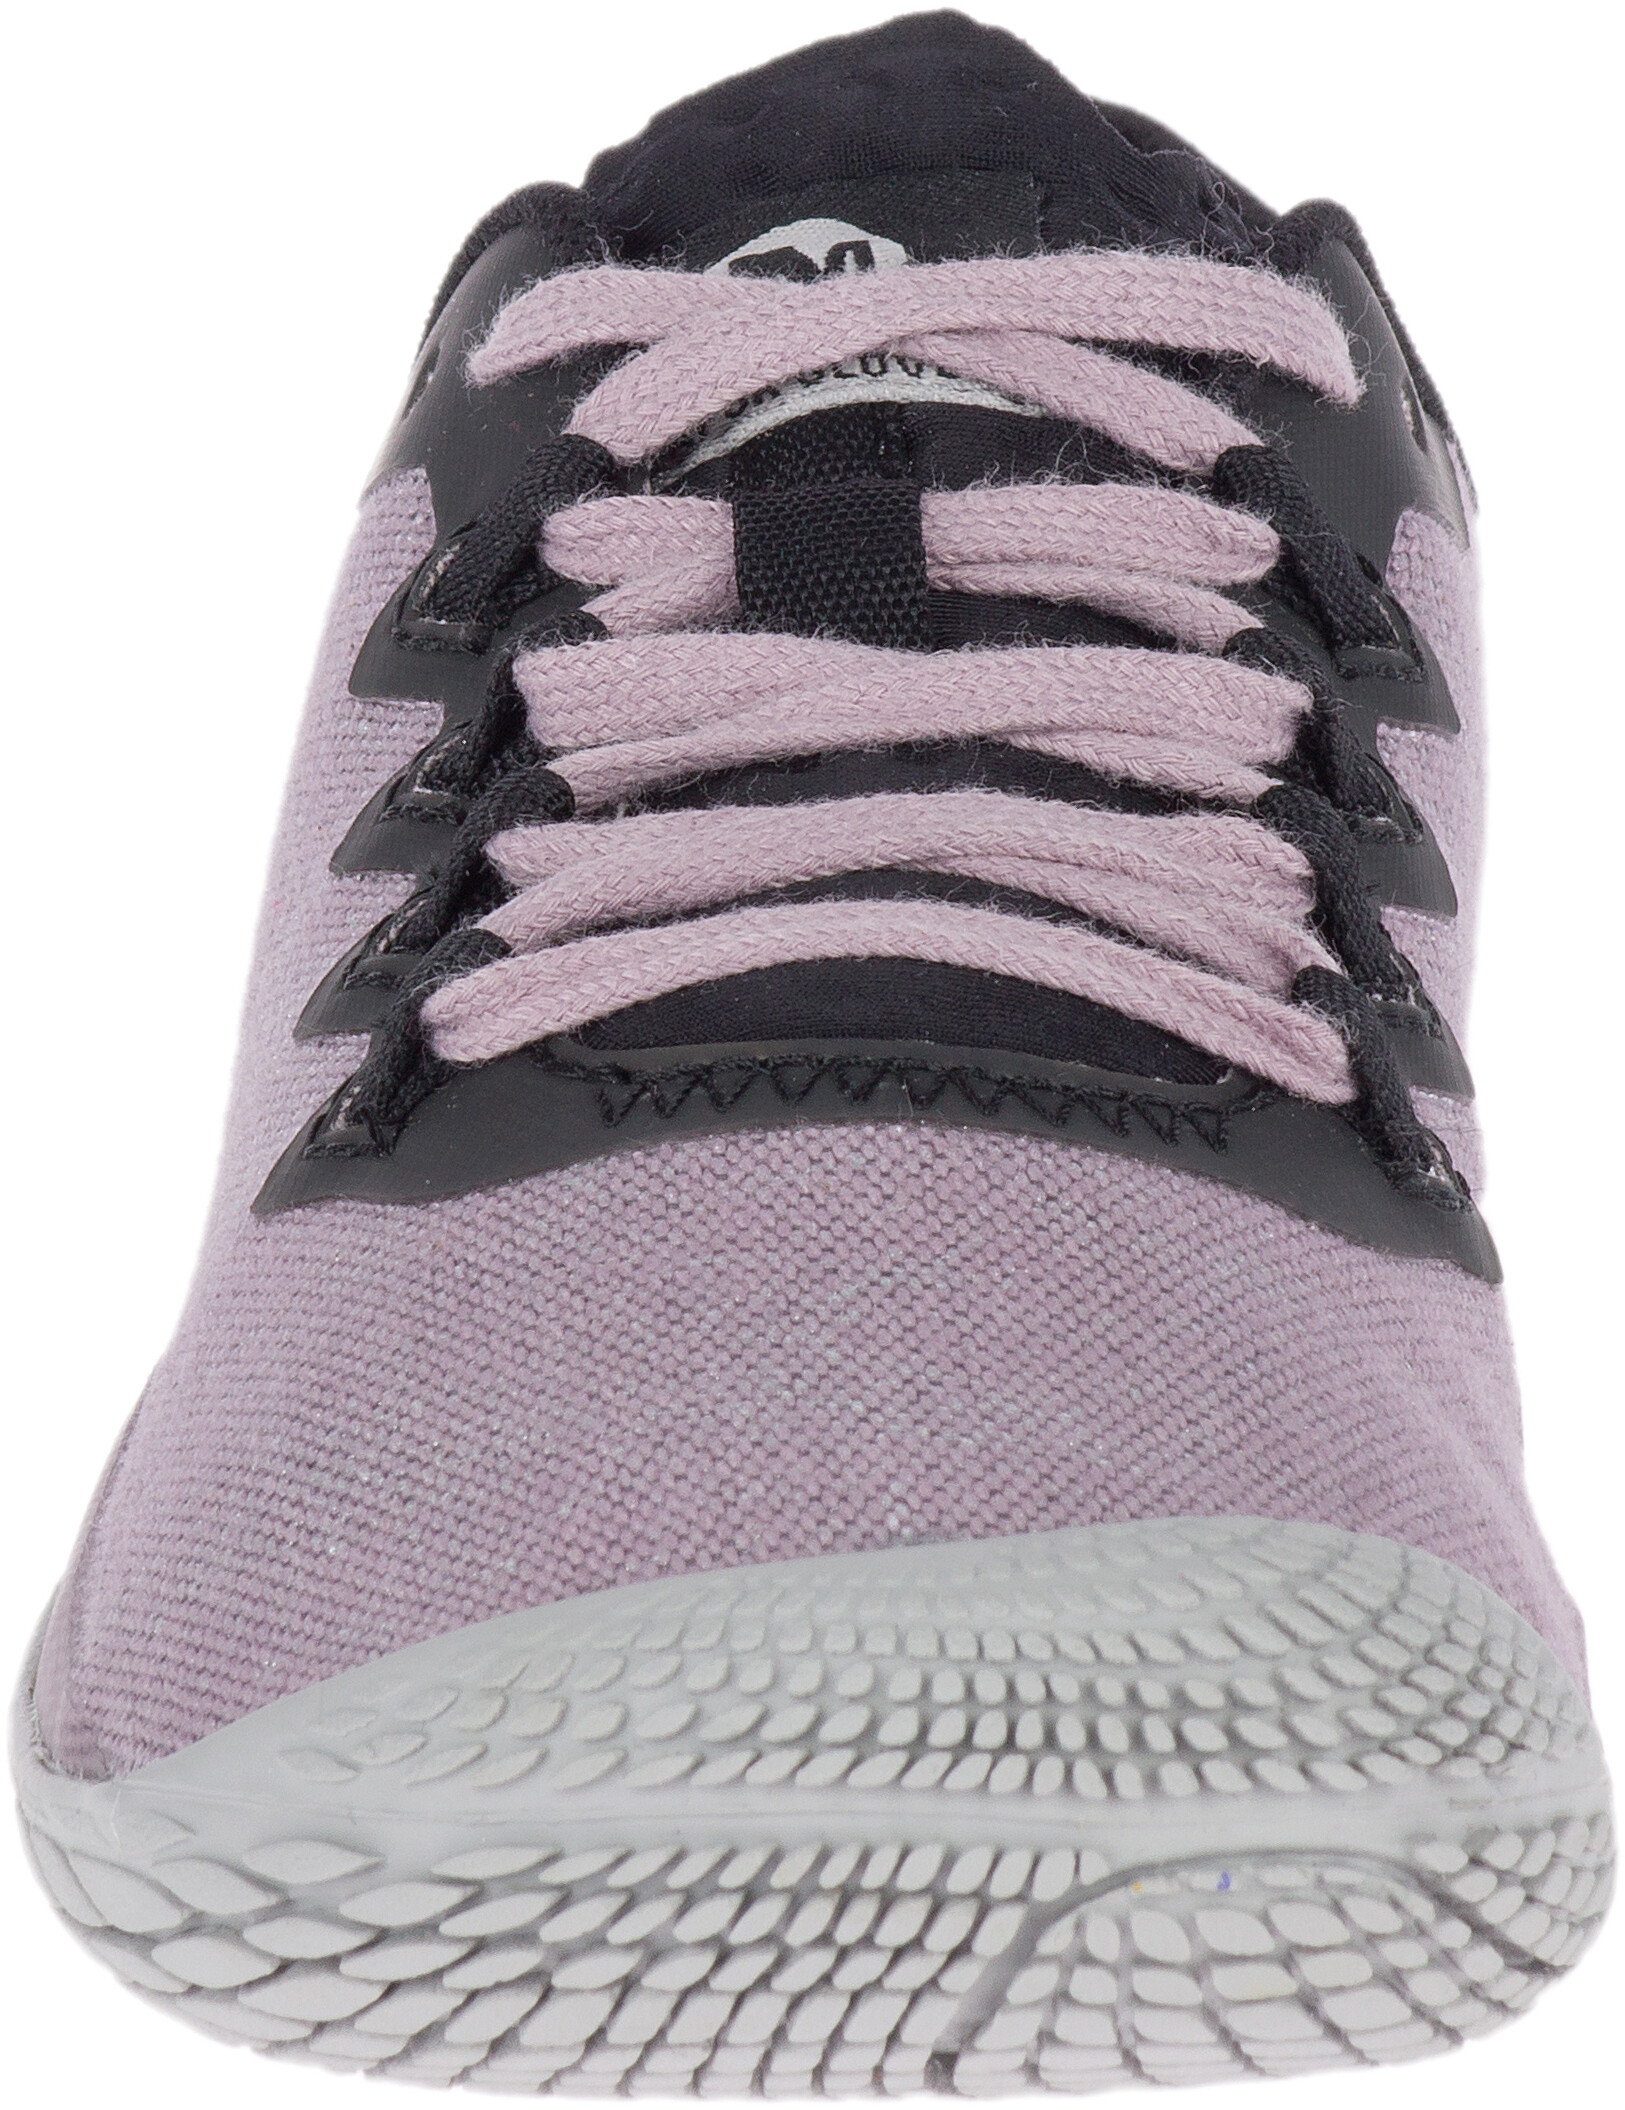 5e1fb392bf2 Merrell Vapor Glove 3 Cotton Shoes Women purple/black at Addnature.co.uk